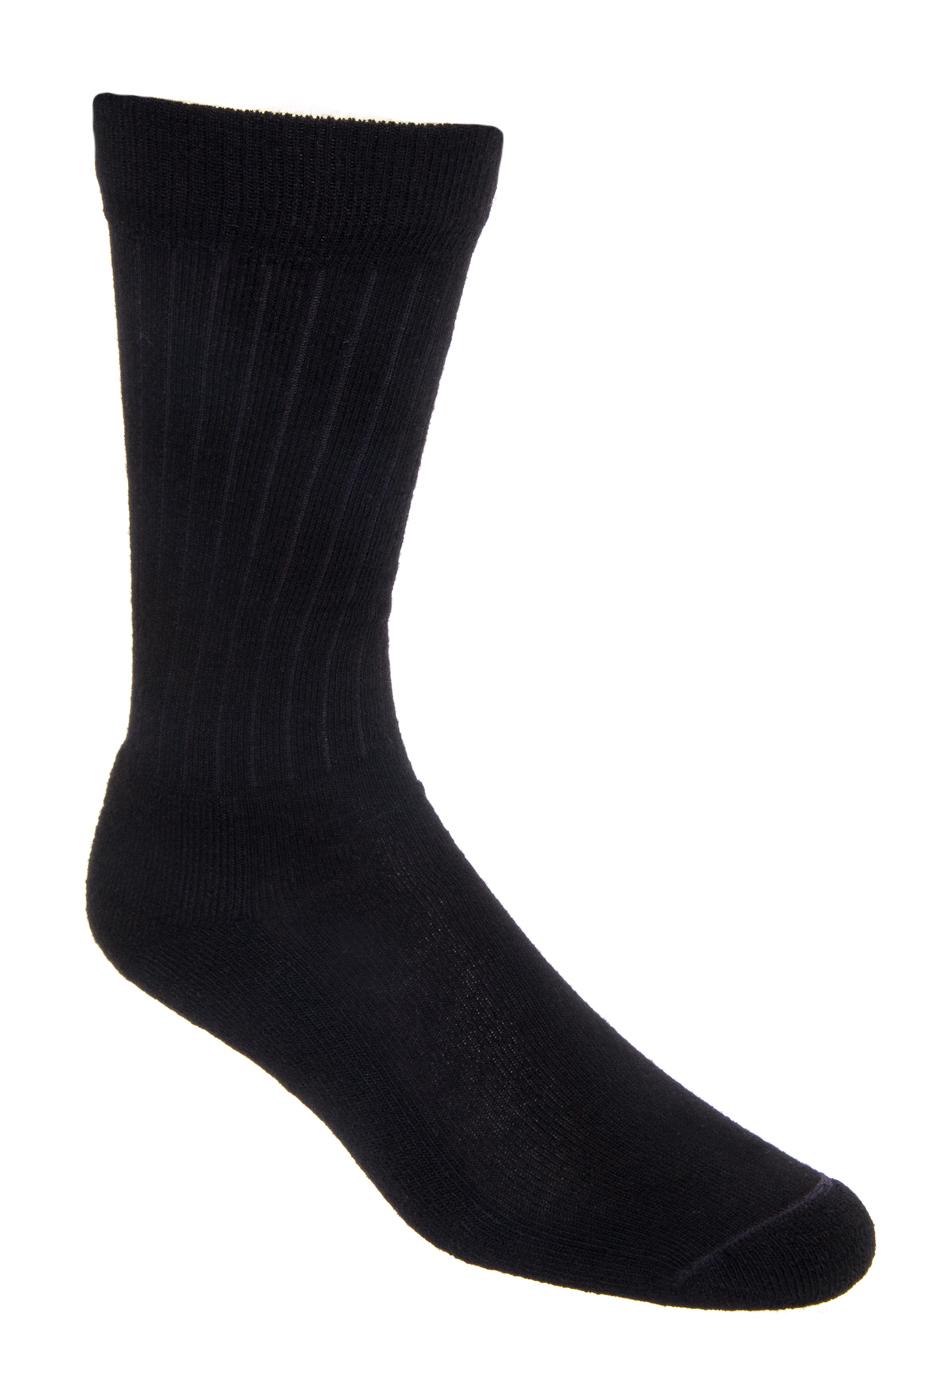 Red Wing Men's Classic Rib 97161 Sock - Black 0014-043-BLACK-01